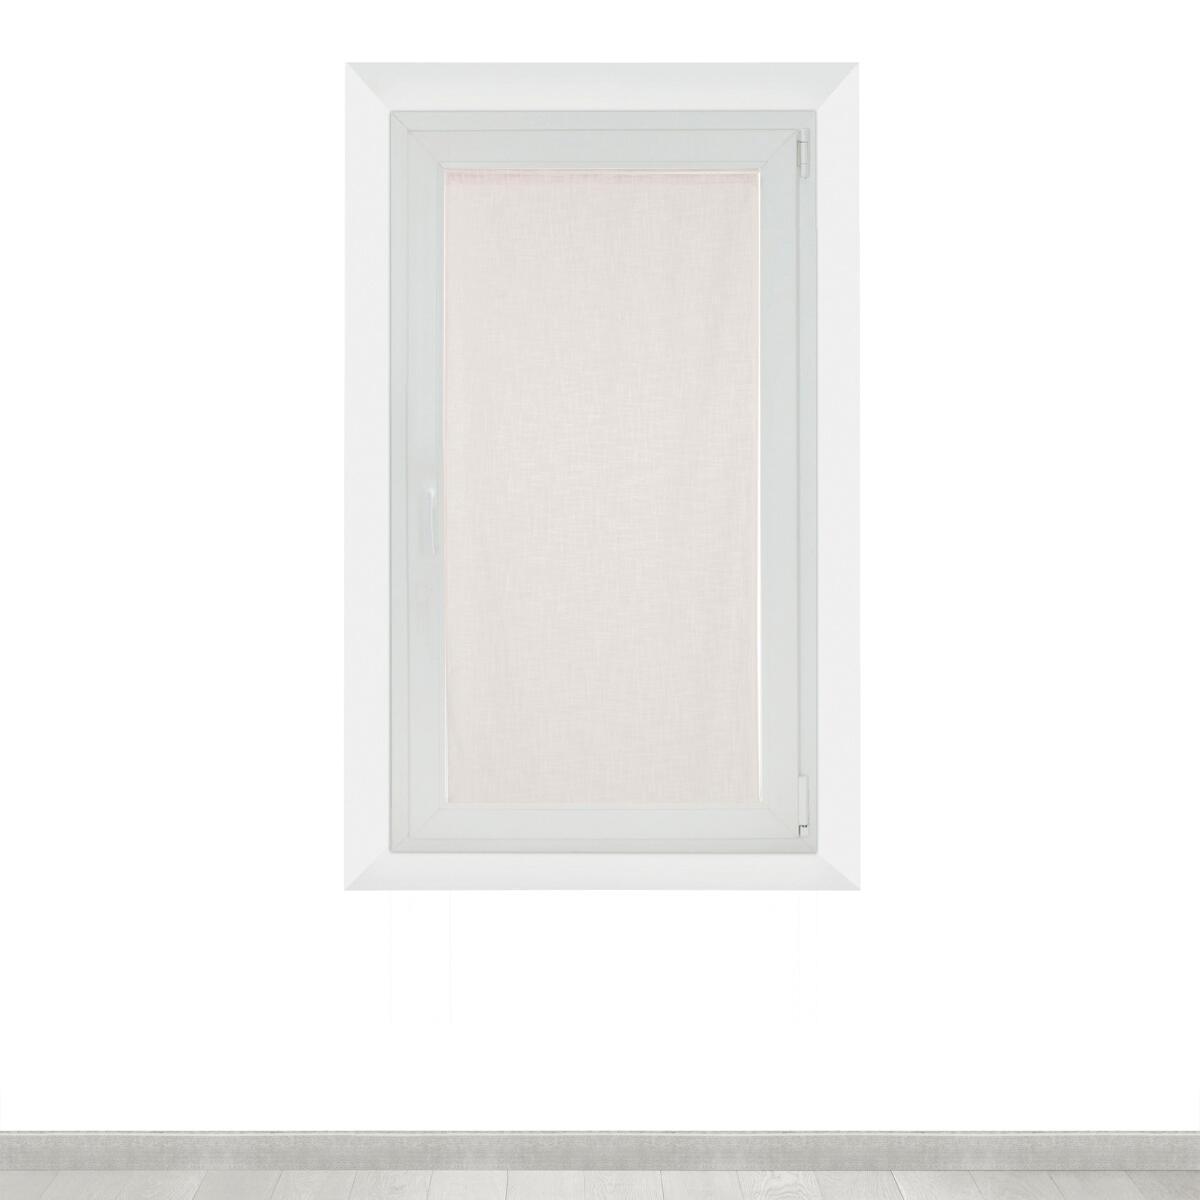 Tendina vetro Infini ecrù tunnel 60 x 120 cm - 2